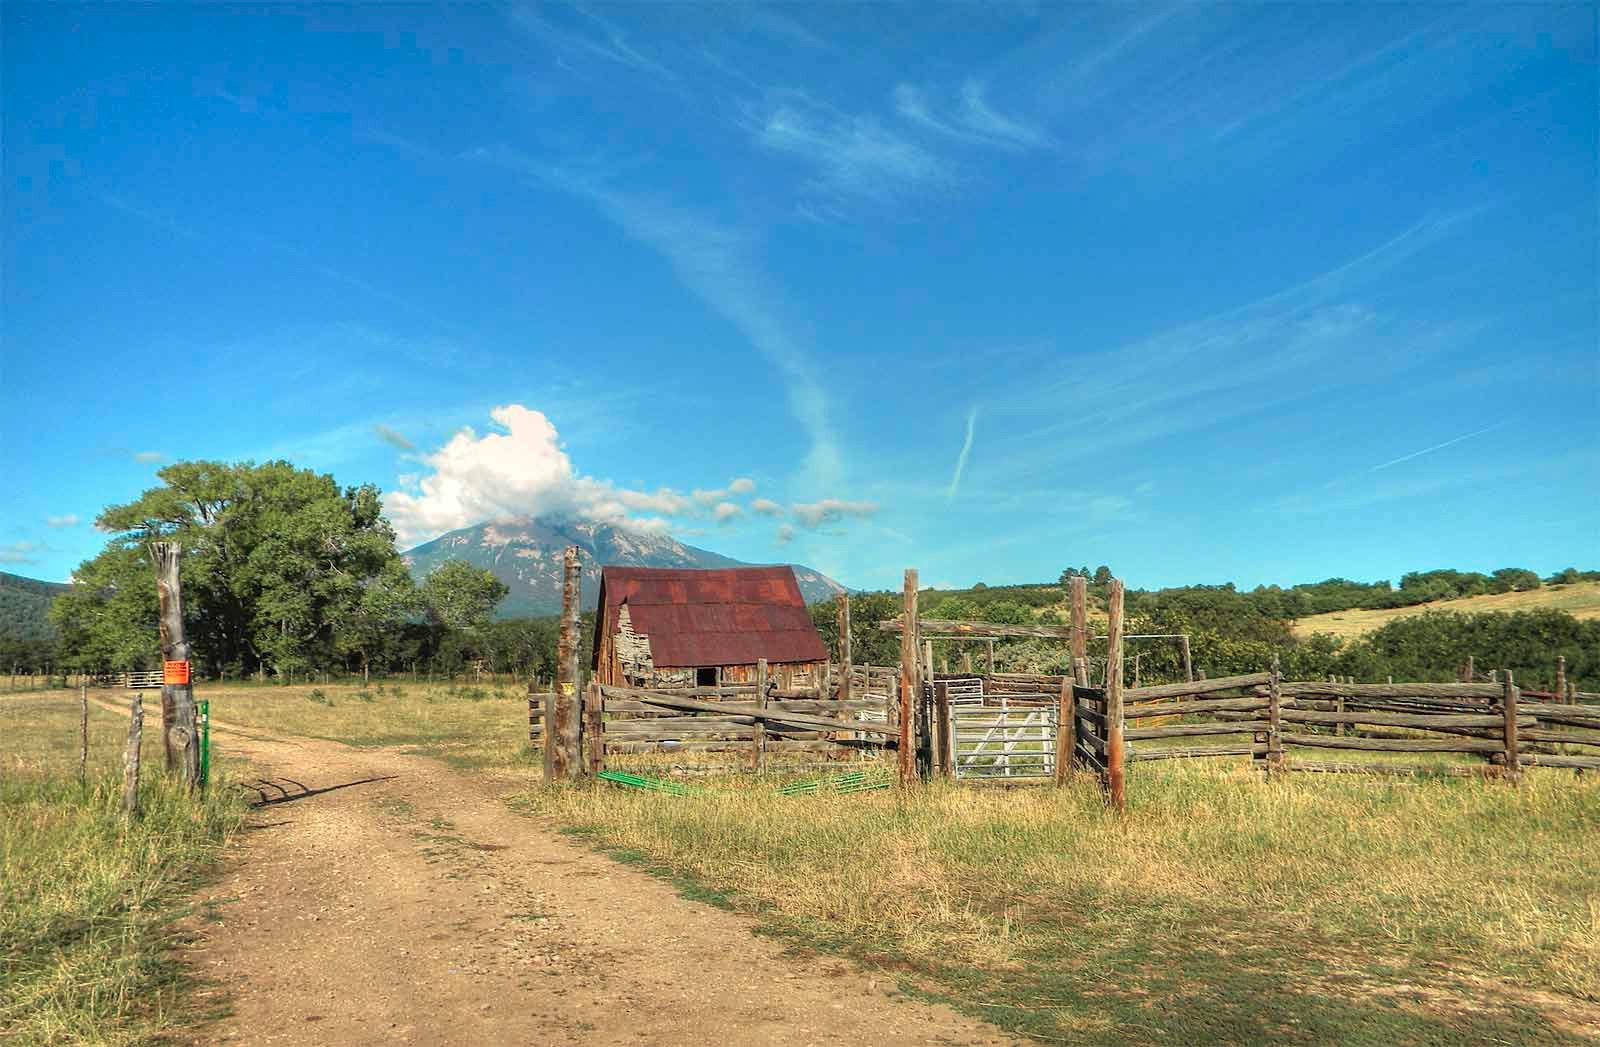 Cattle-&-wildlife,-2012-072_tonemapped